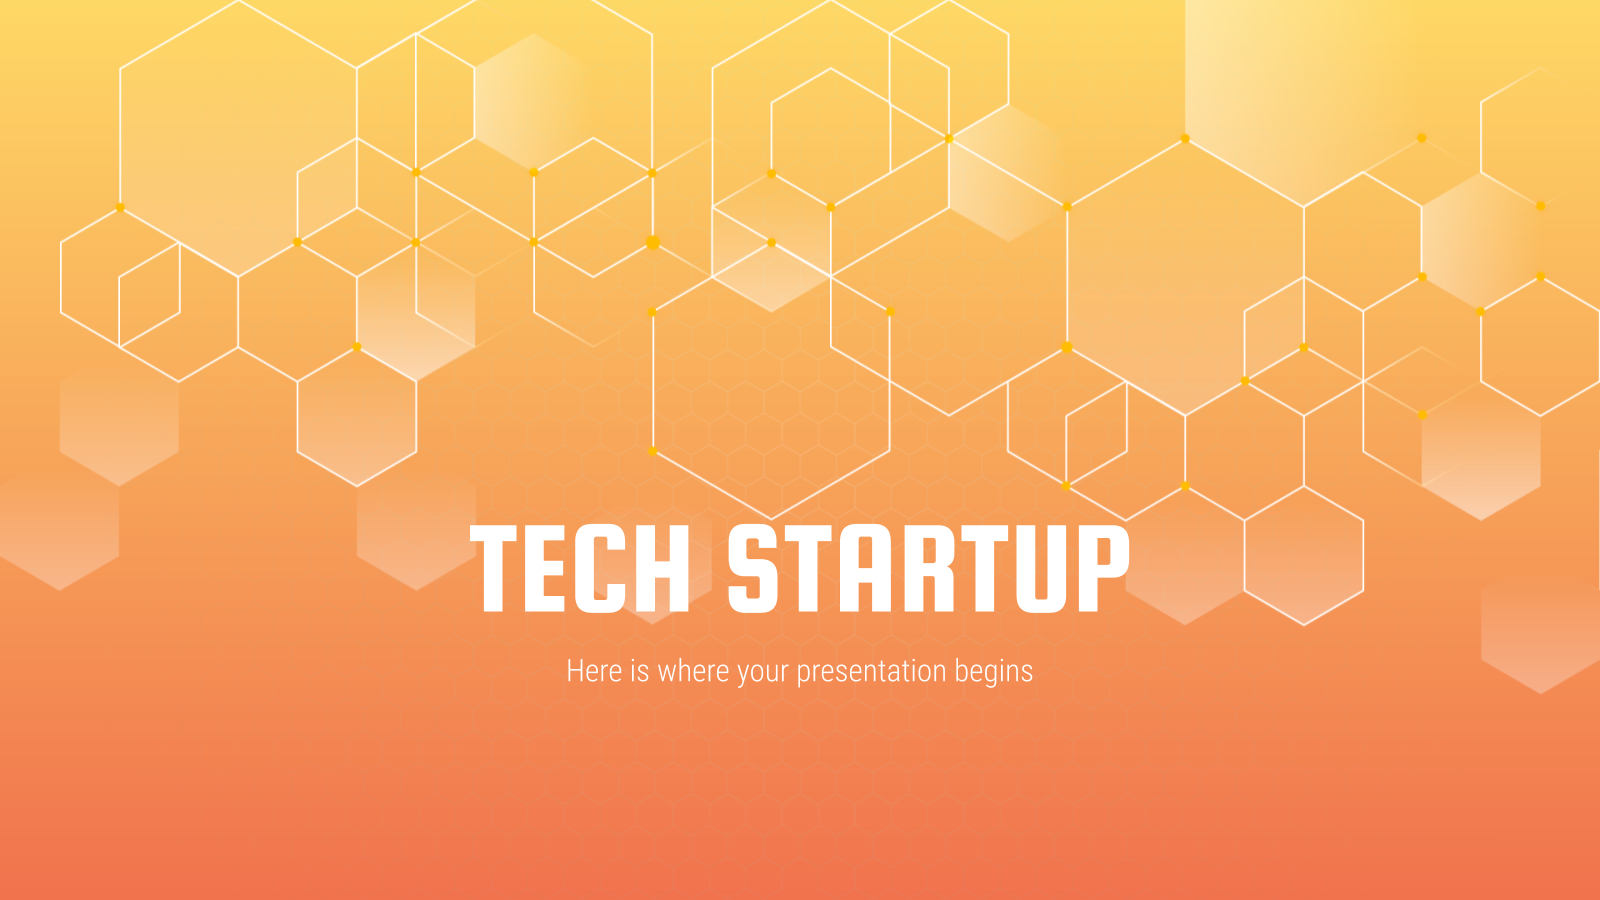 Plantilla de presentación Startup tecnológica